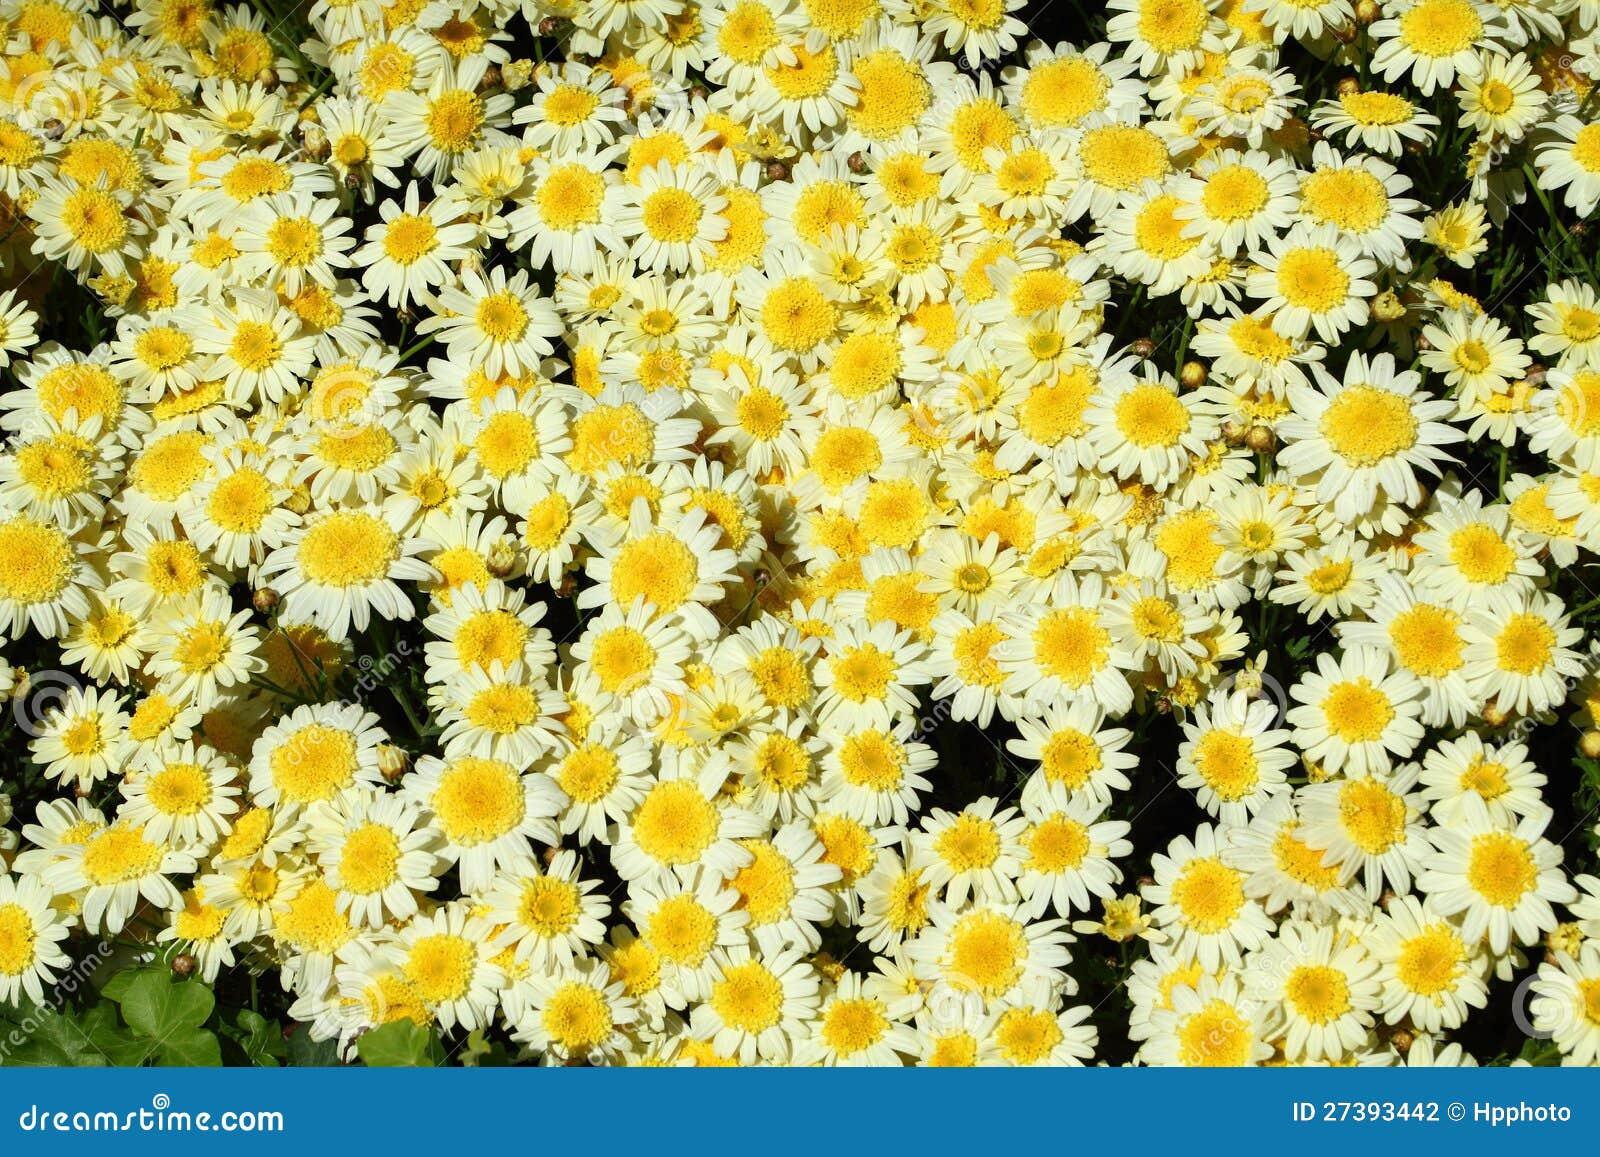 Chrysanthemum Flower In The Garden Background Stock Photography